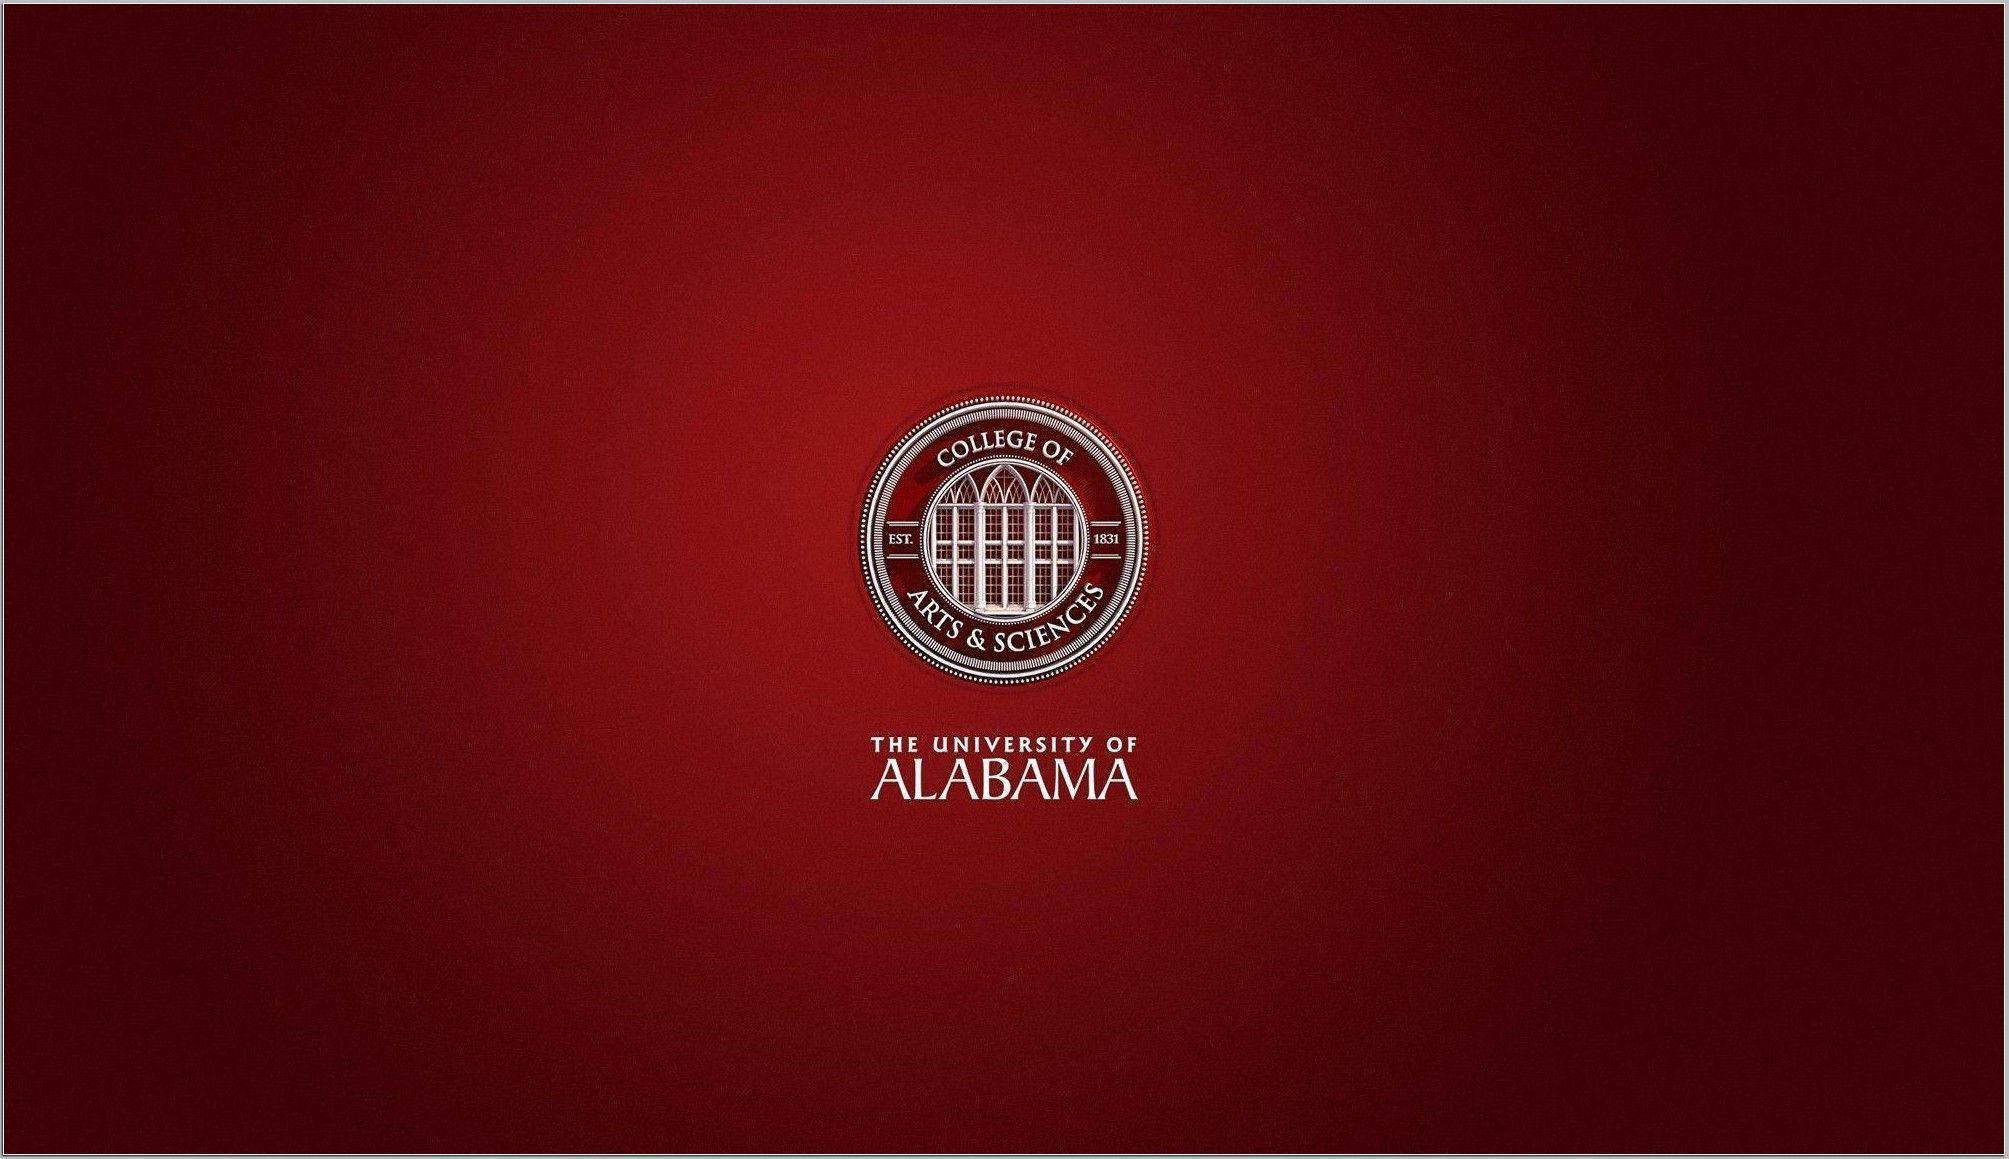 Alabama Crimson Tide Wallpapers Top Free Alabama Crimson Tide